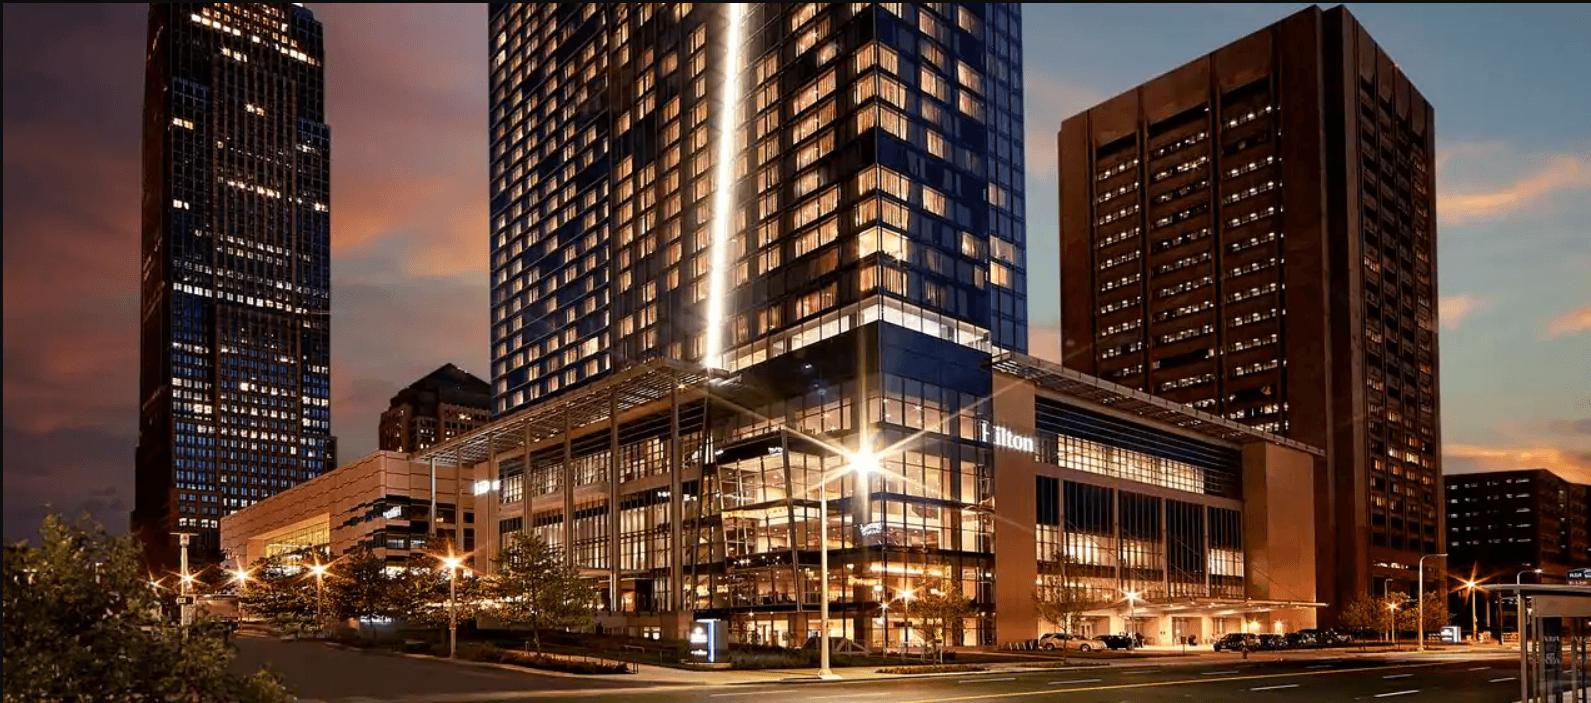 Hilton Downtown Cleveland